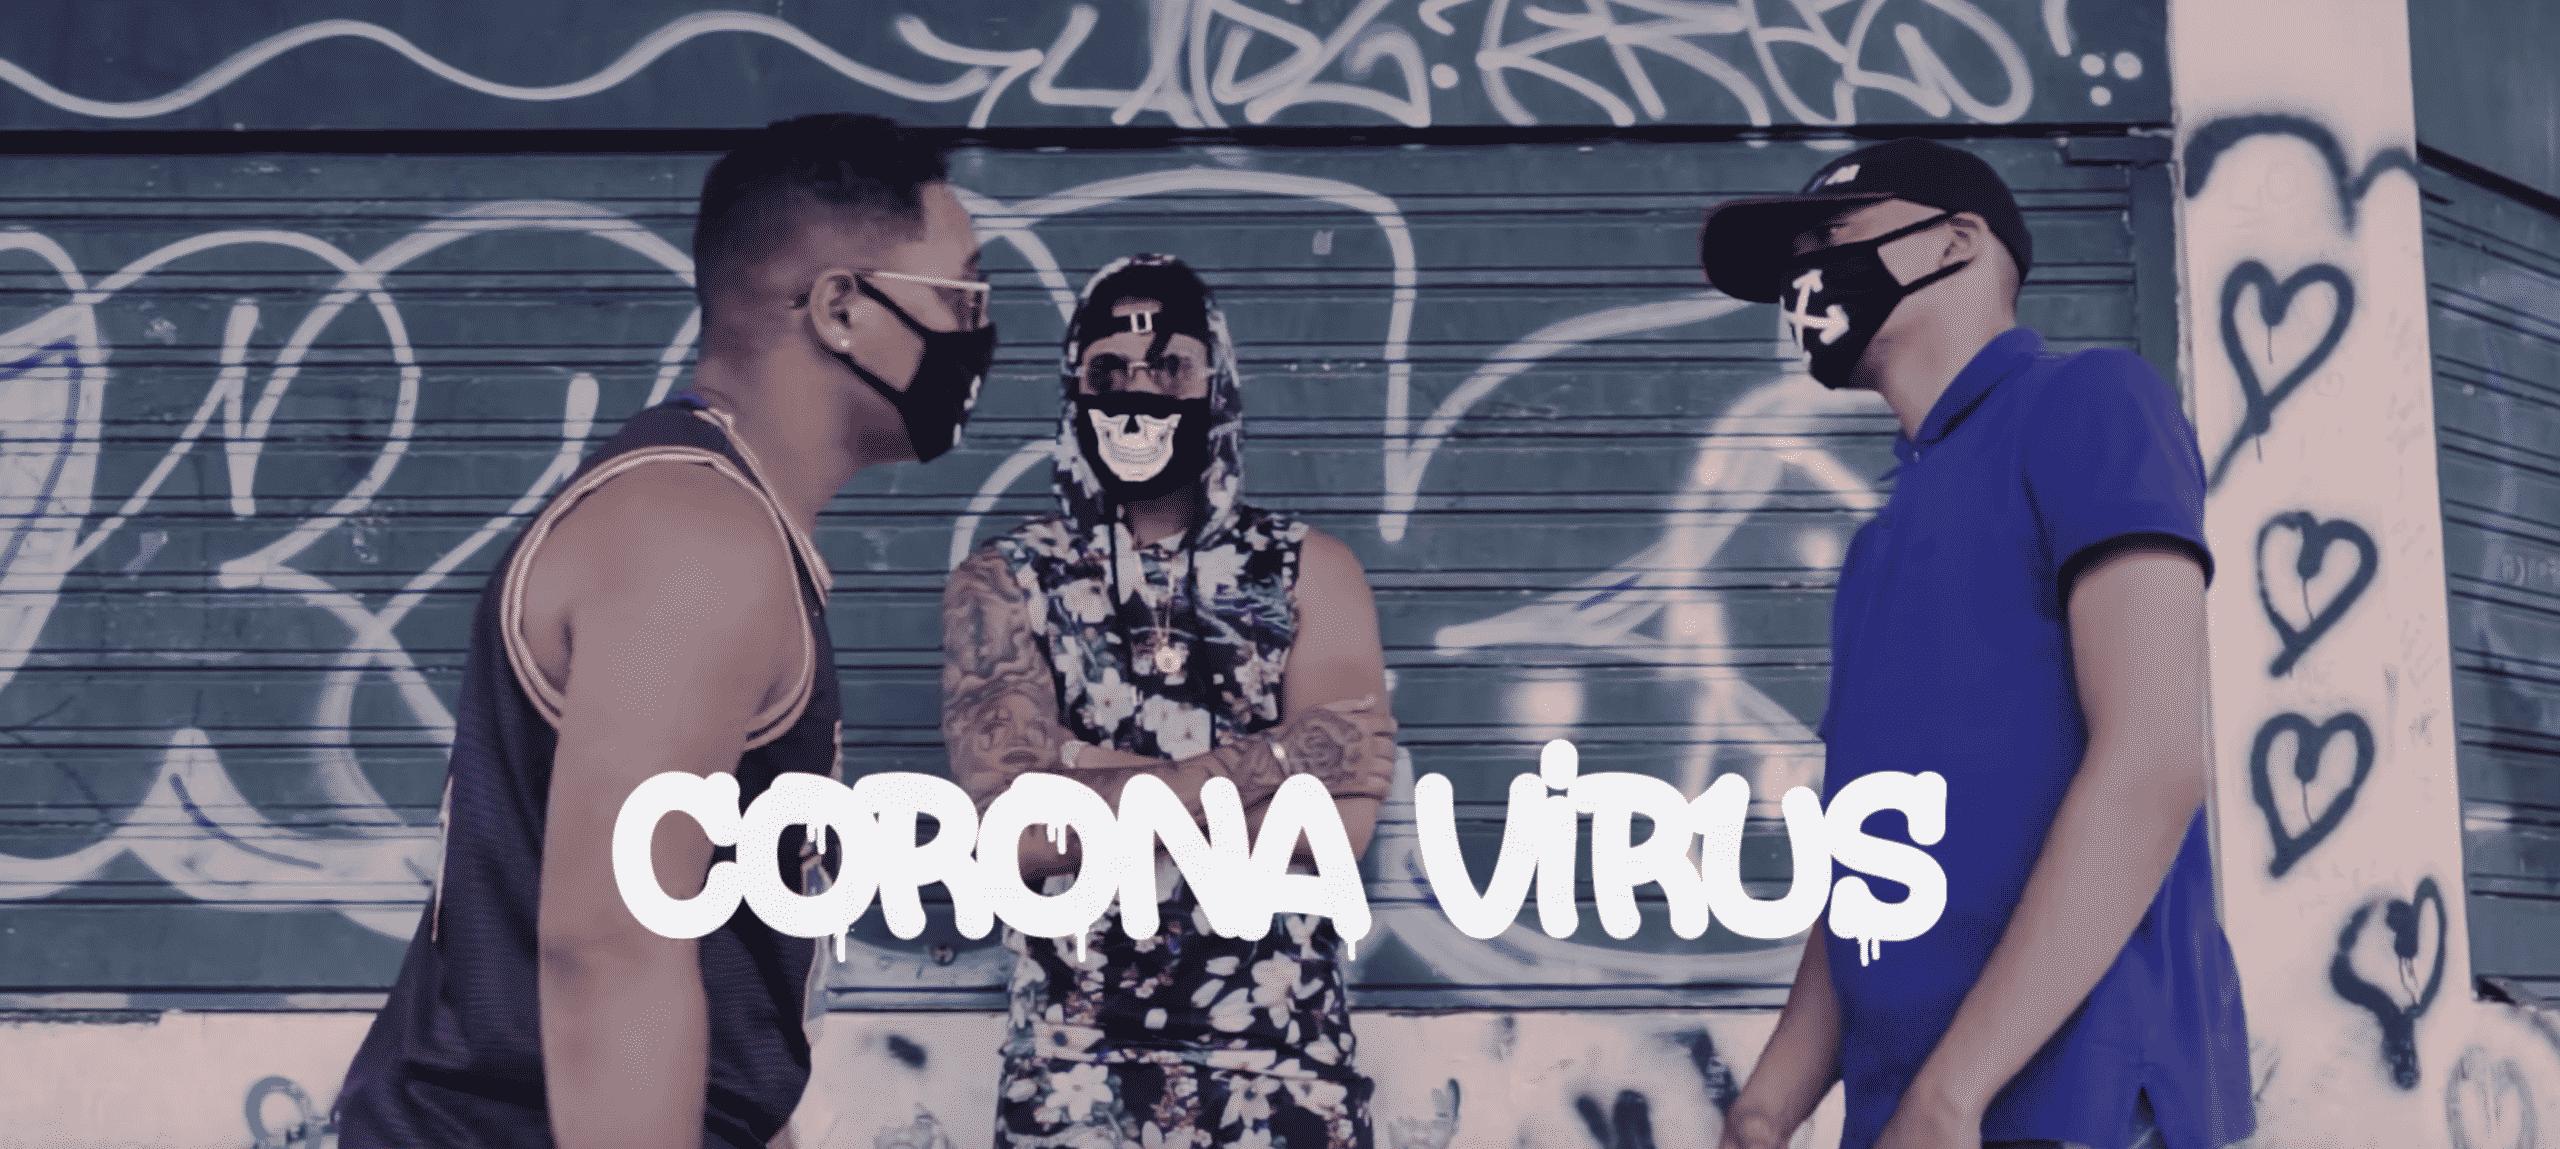 Le coronavirus inspire : DJ Bob présente sa création très afro !